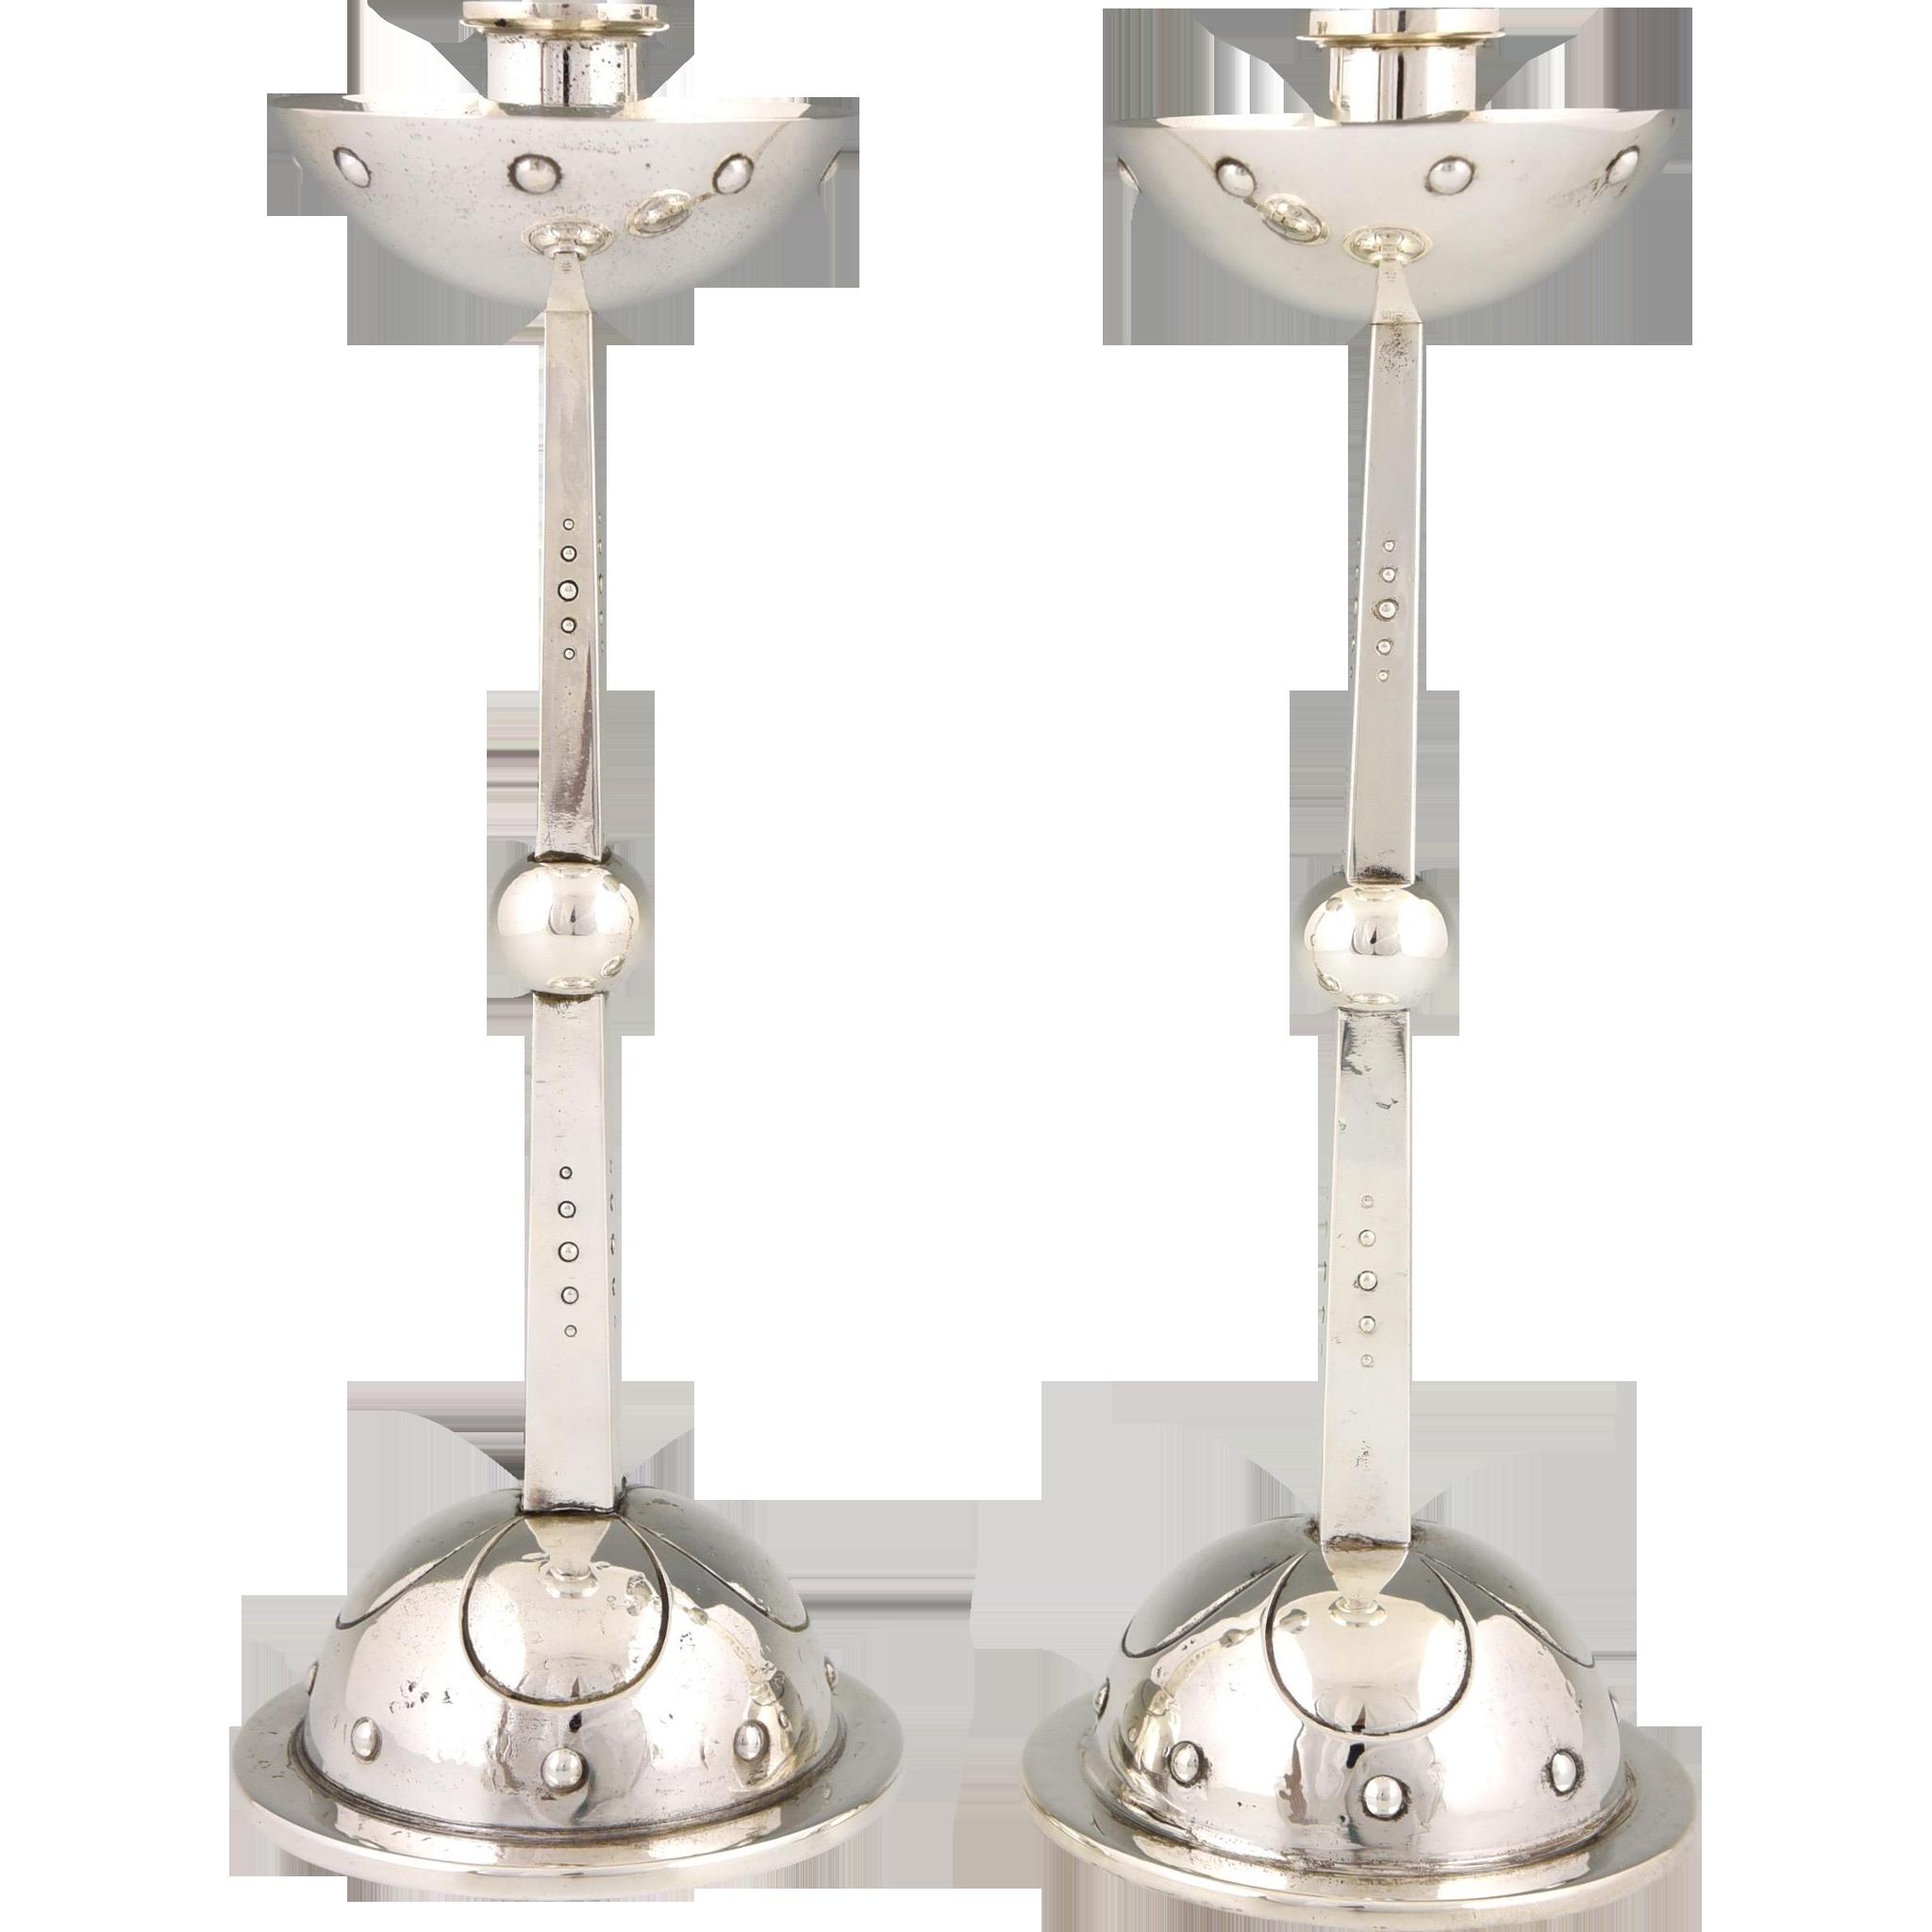 Original Art Nouveau candlesticks by WMF 1910 Germany @shoprubylux #Deconamic #20thCentury